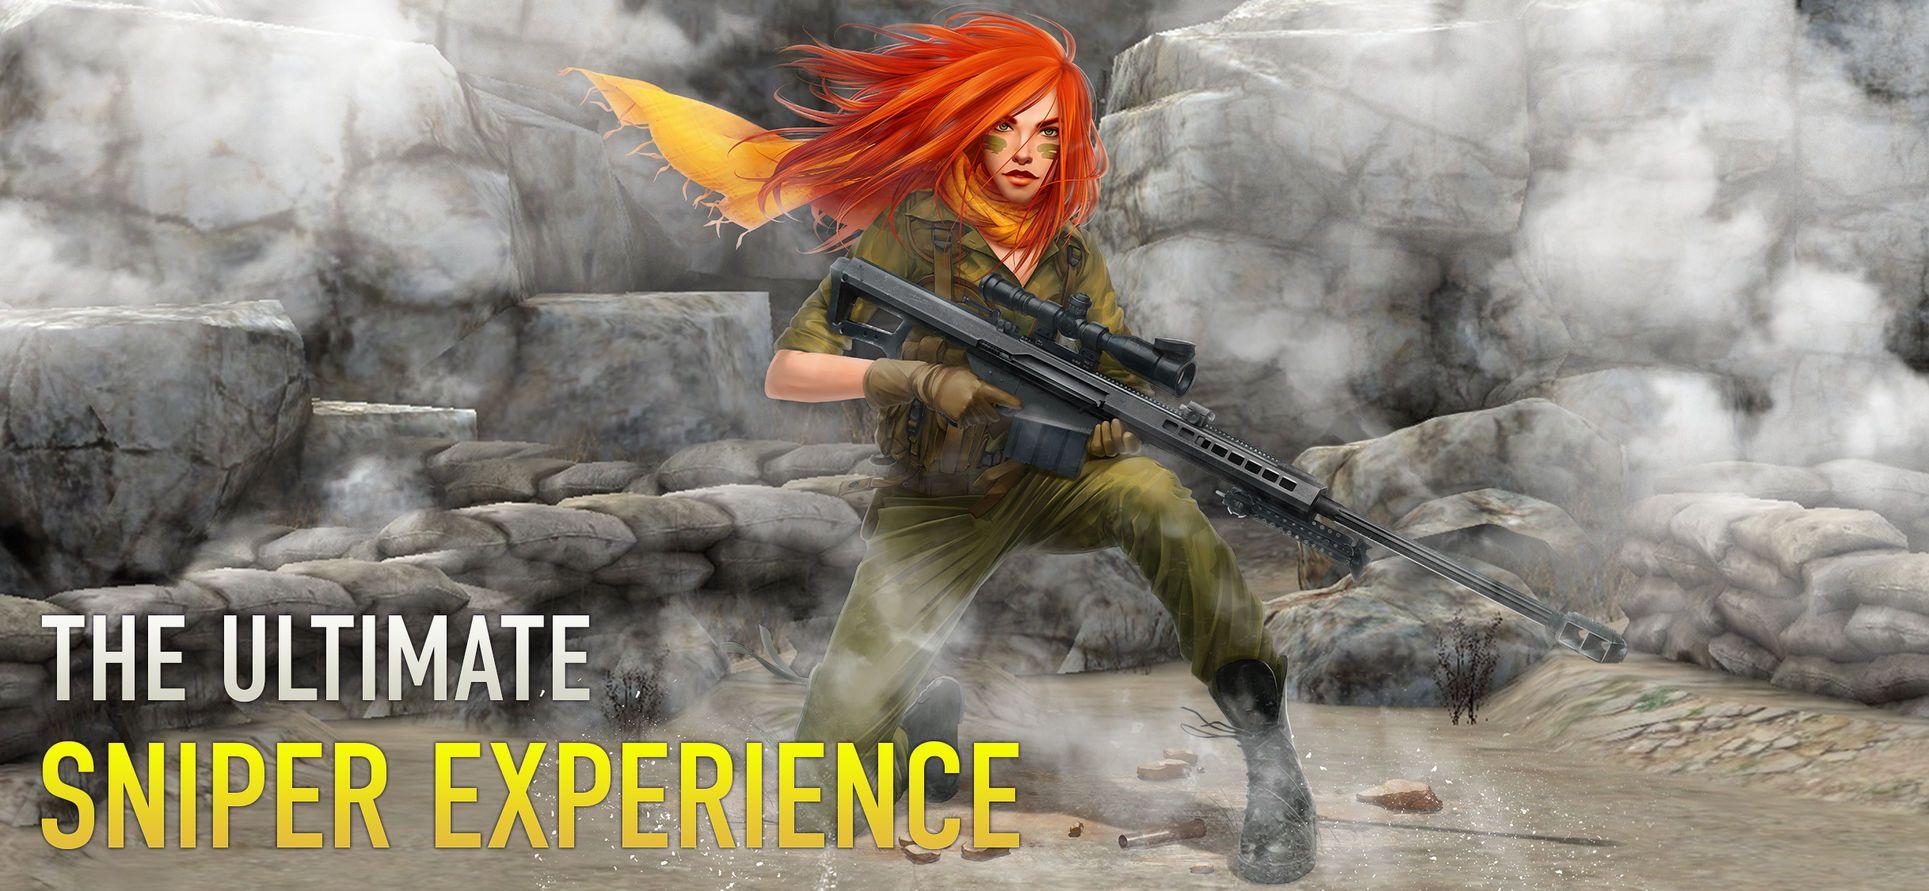 Sniper Arena Online PvP Game GamesNordcurrentAction